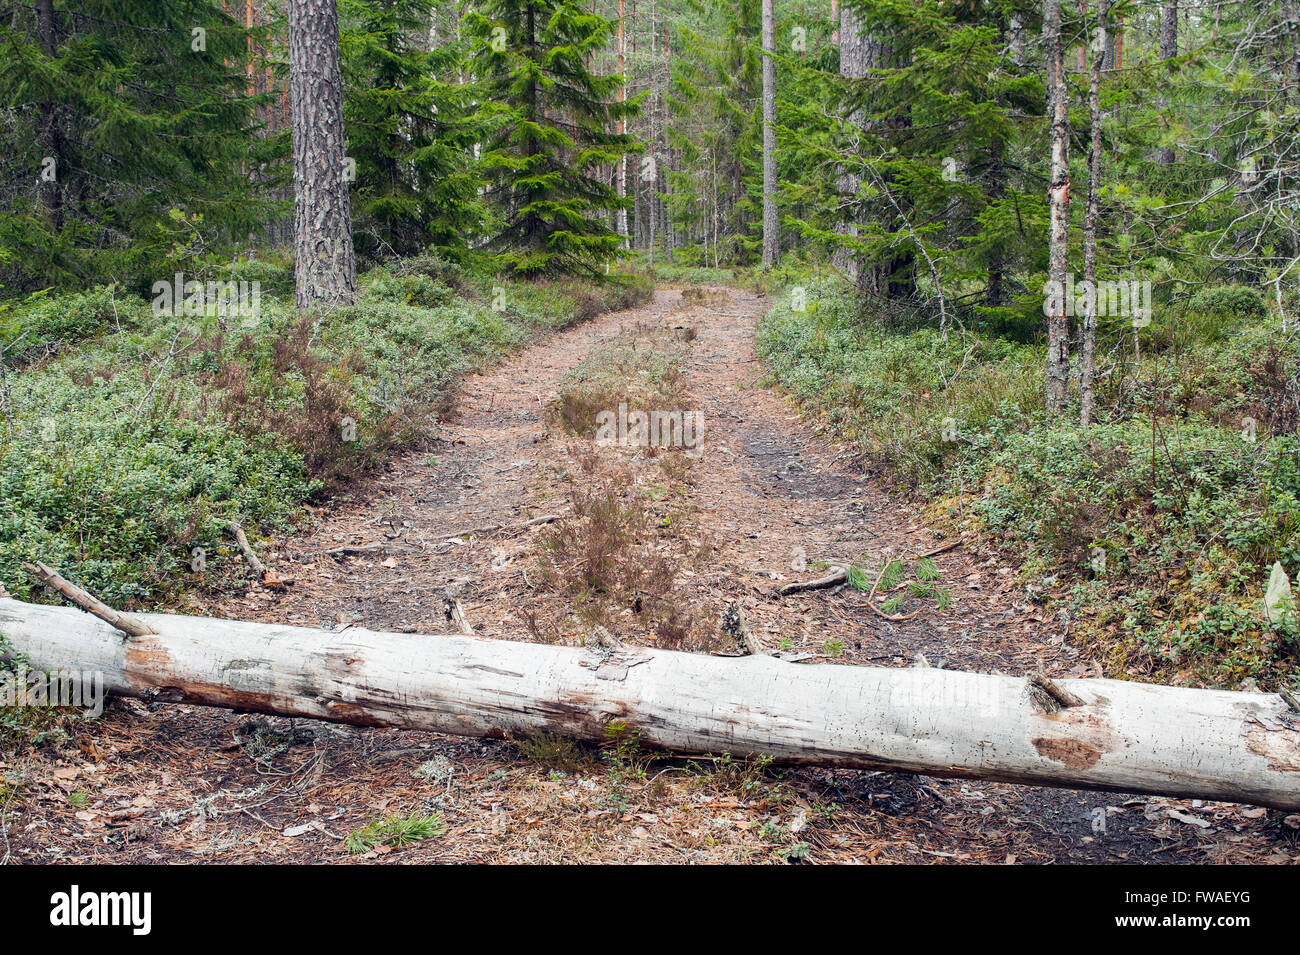 Forest road blocked by fallen tree, Sweden - Stock Image